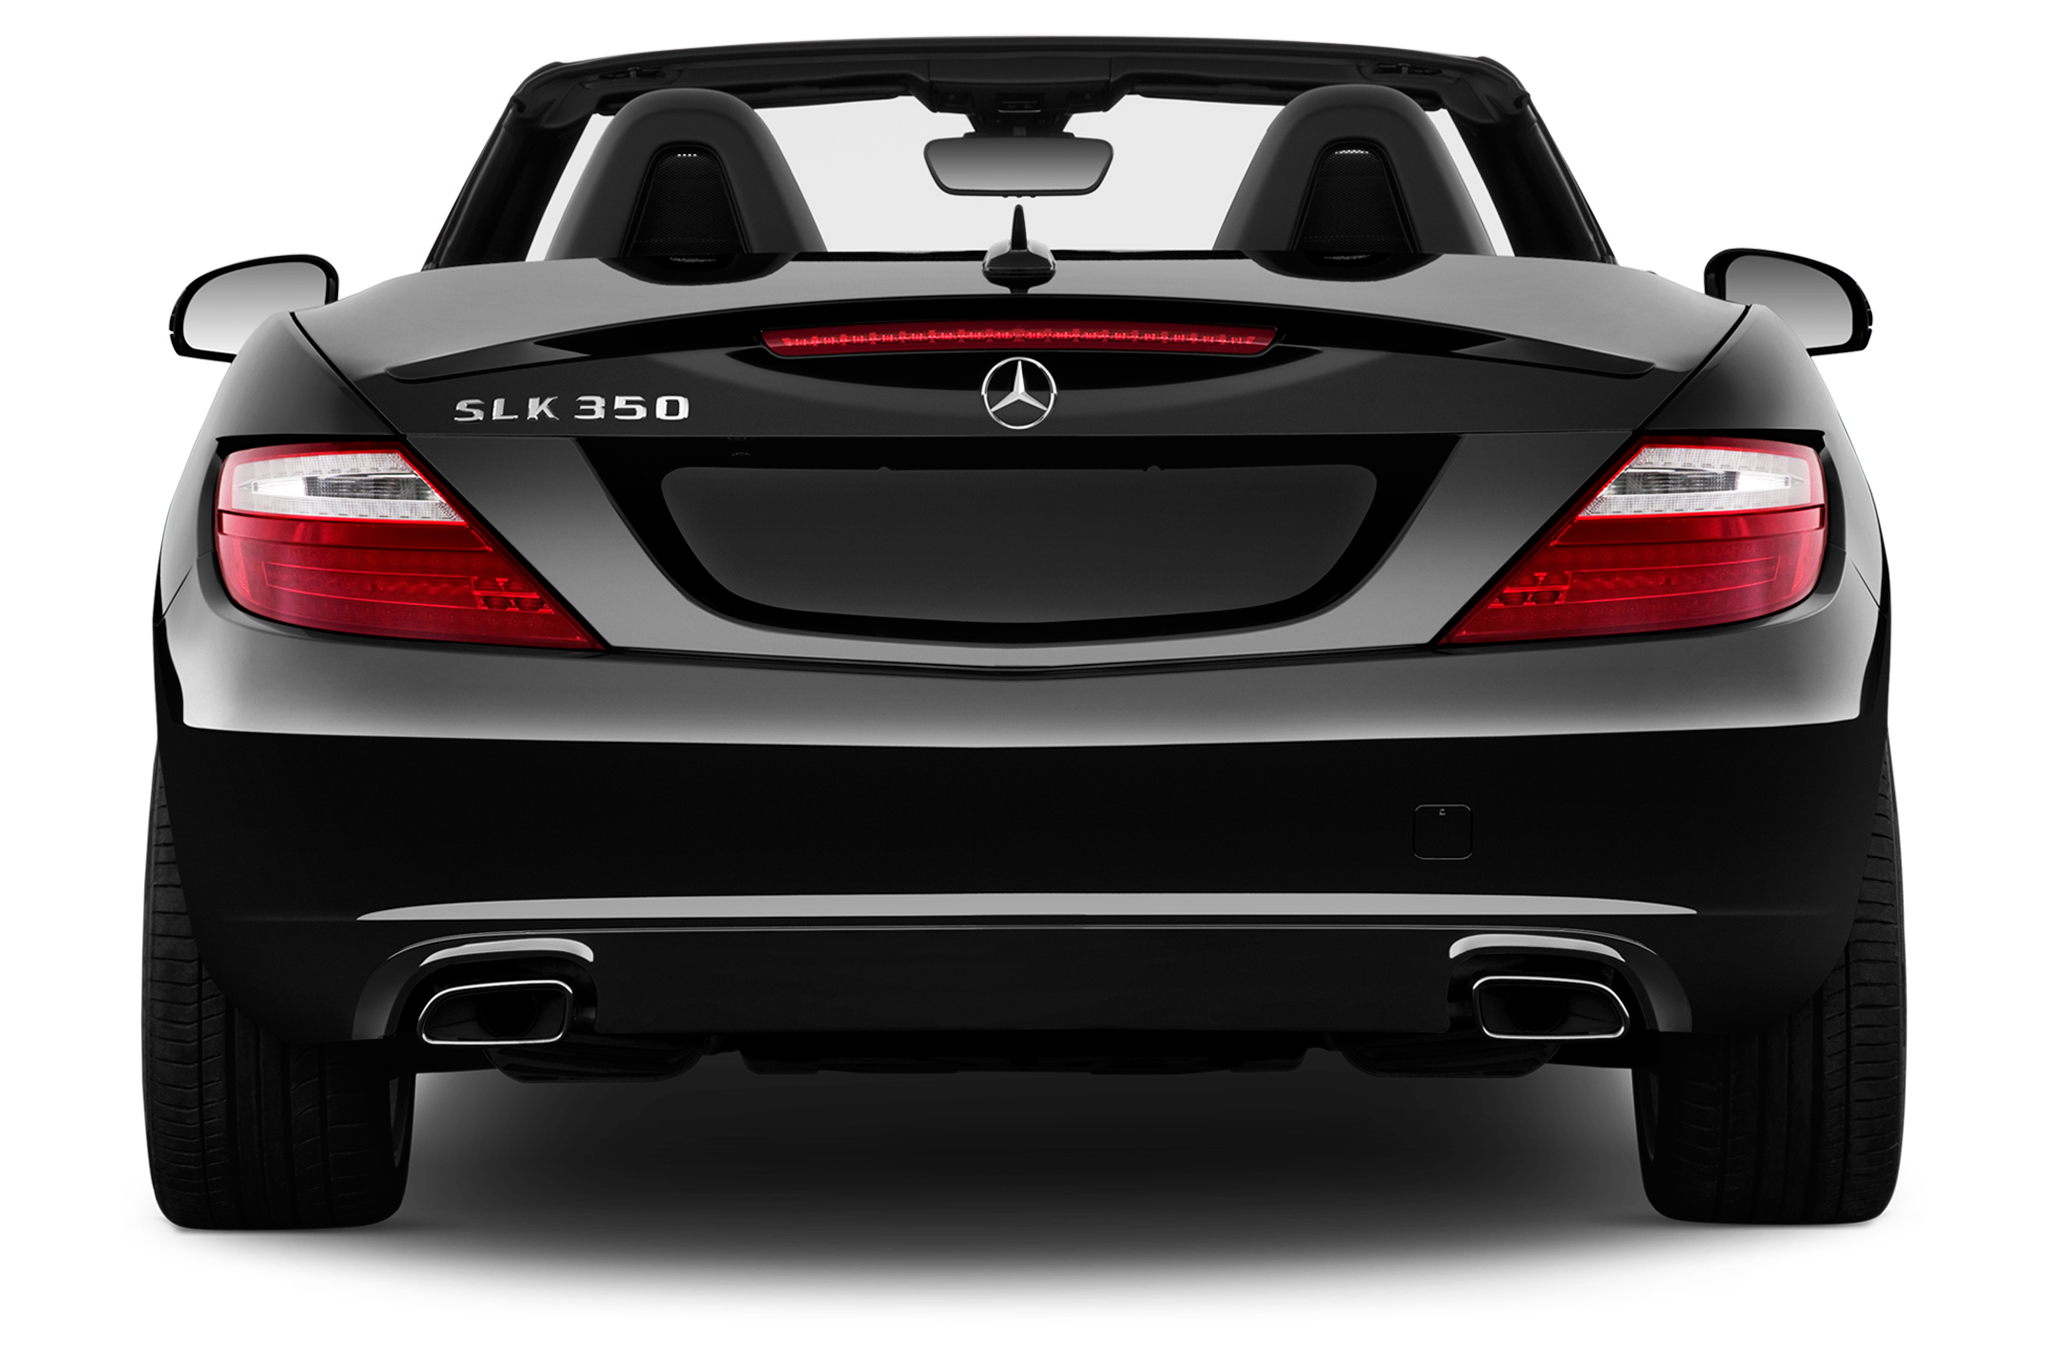 2012 Mercedes Benz Slk250 Editors Notebook Automobile Magazine October Fuse Box Diagram 4 25